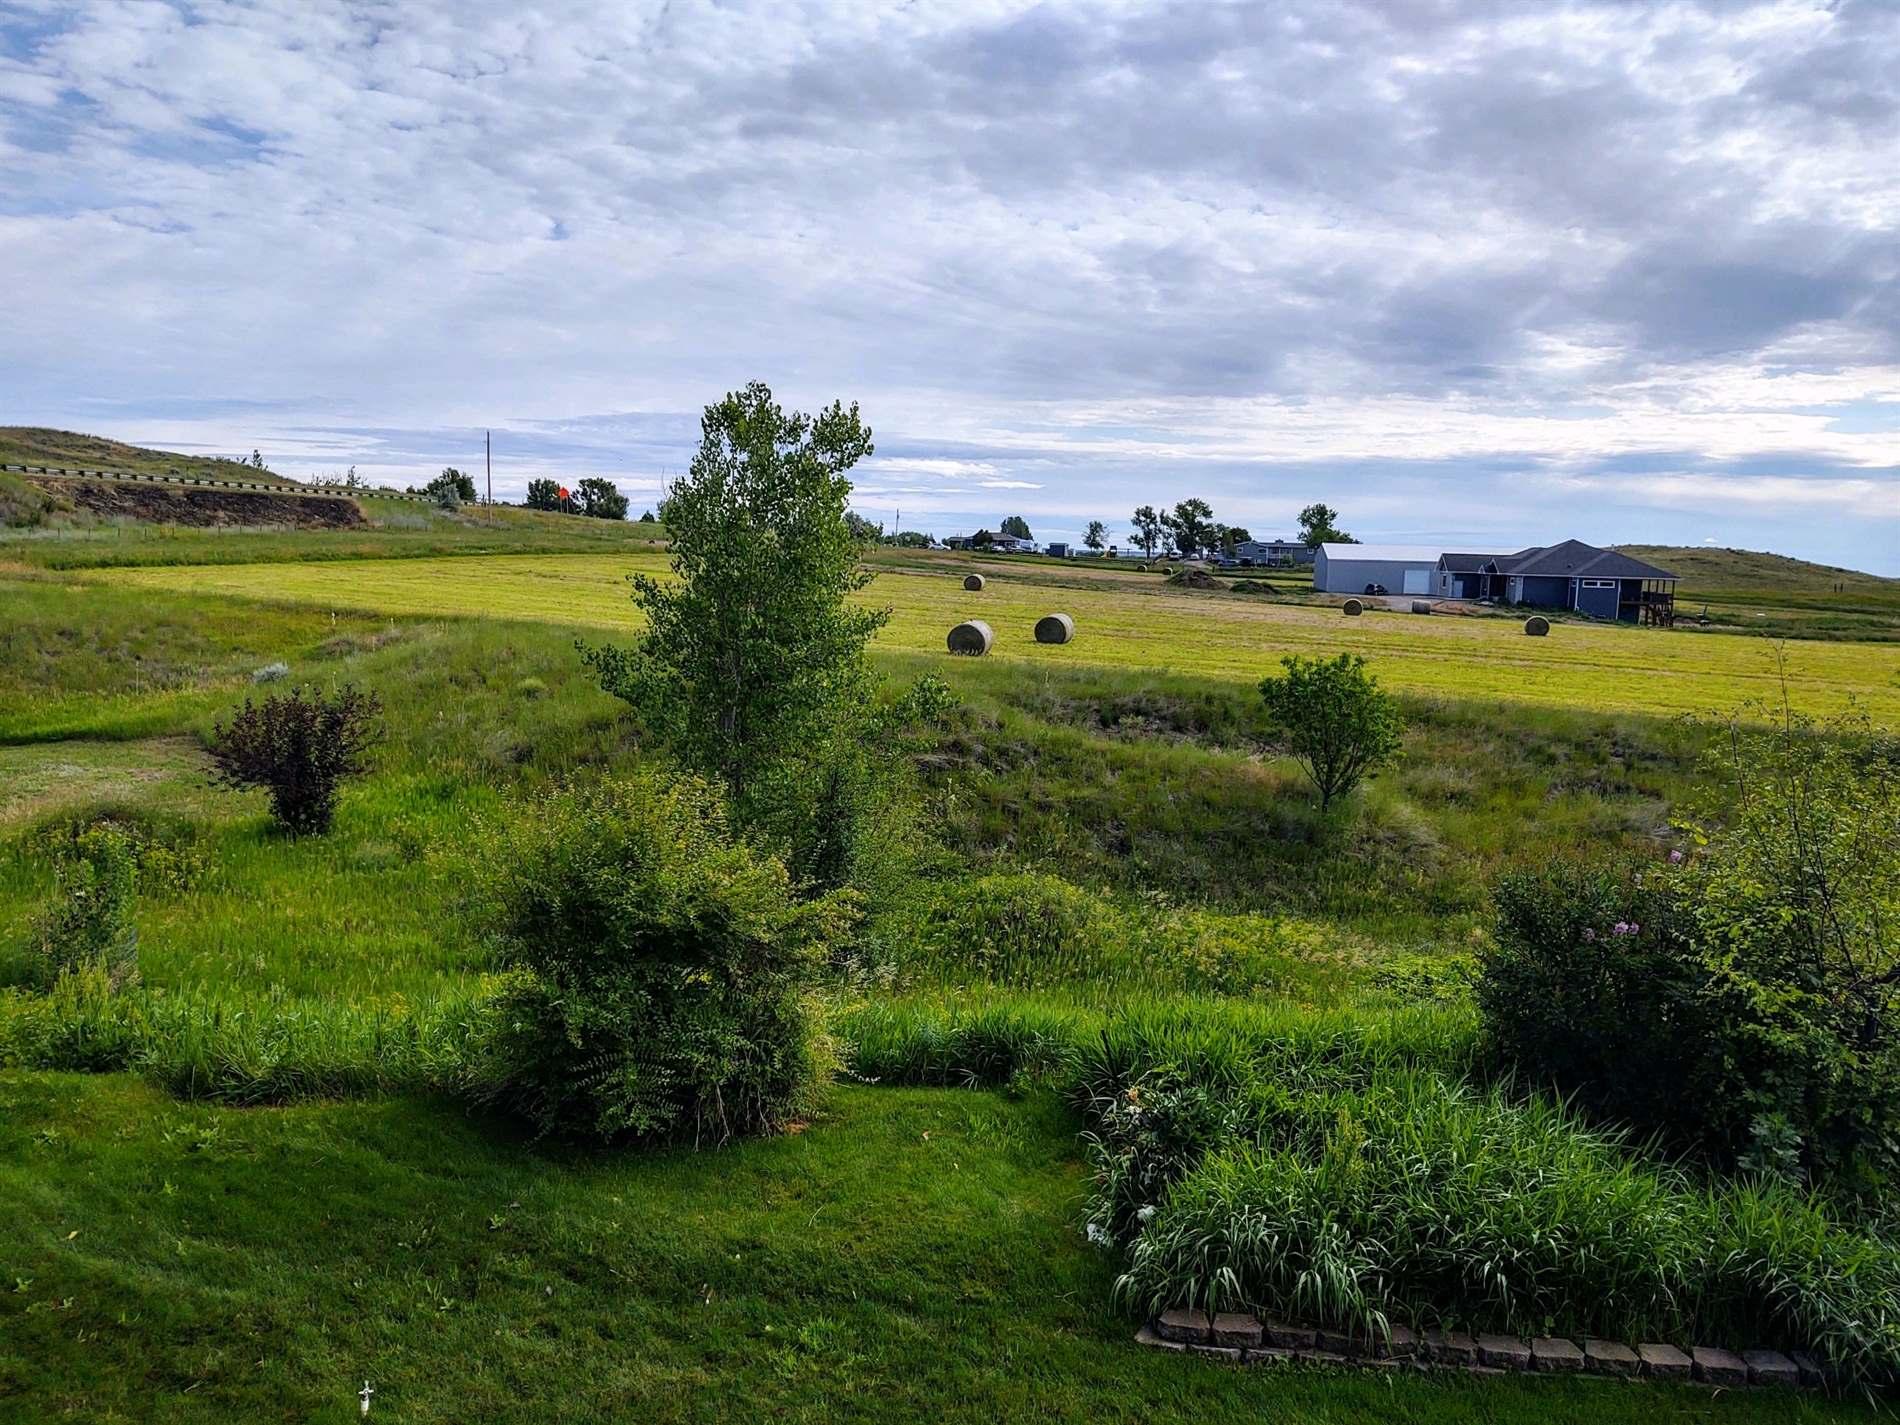 1755 Grants Coulee Drive, Billings, MT 59105